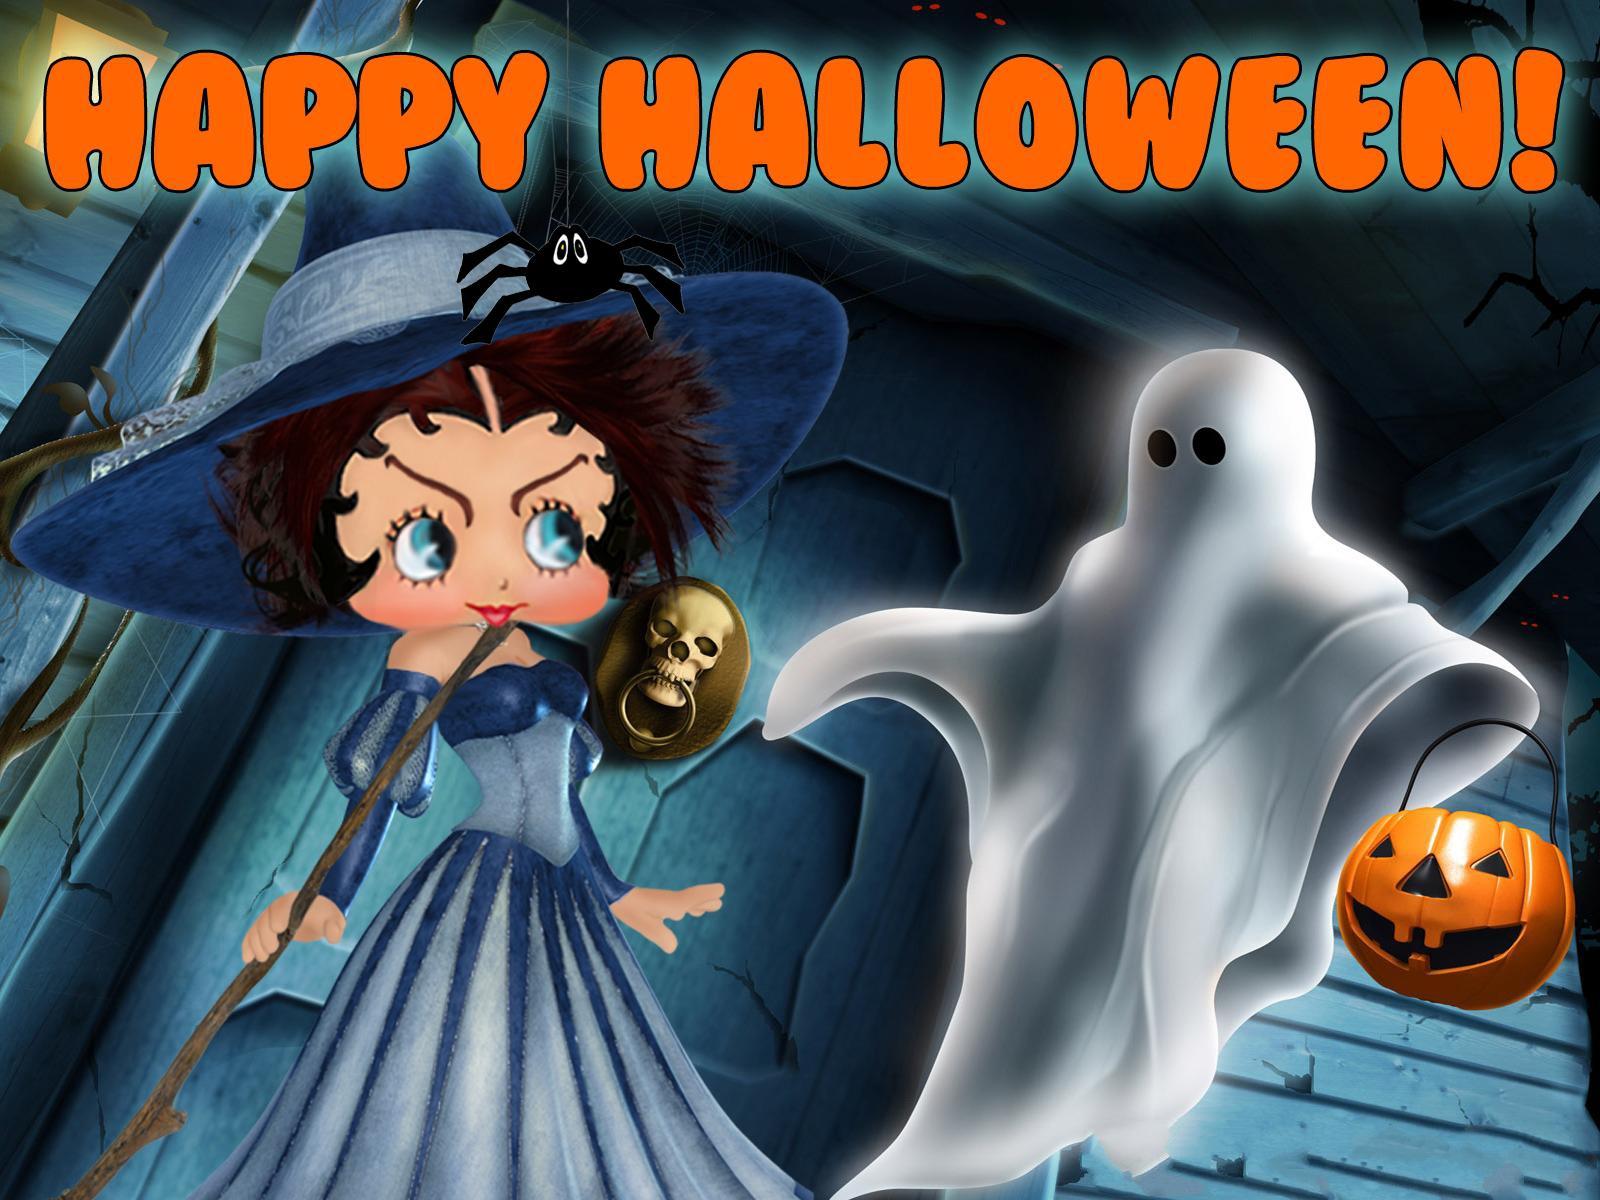 hd betty boop halloween background | pixelstalk